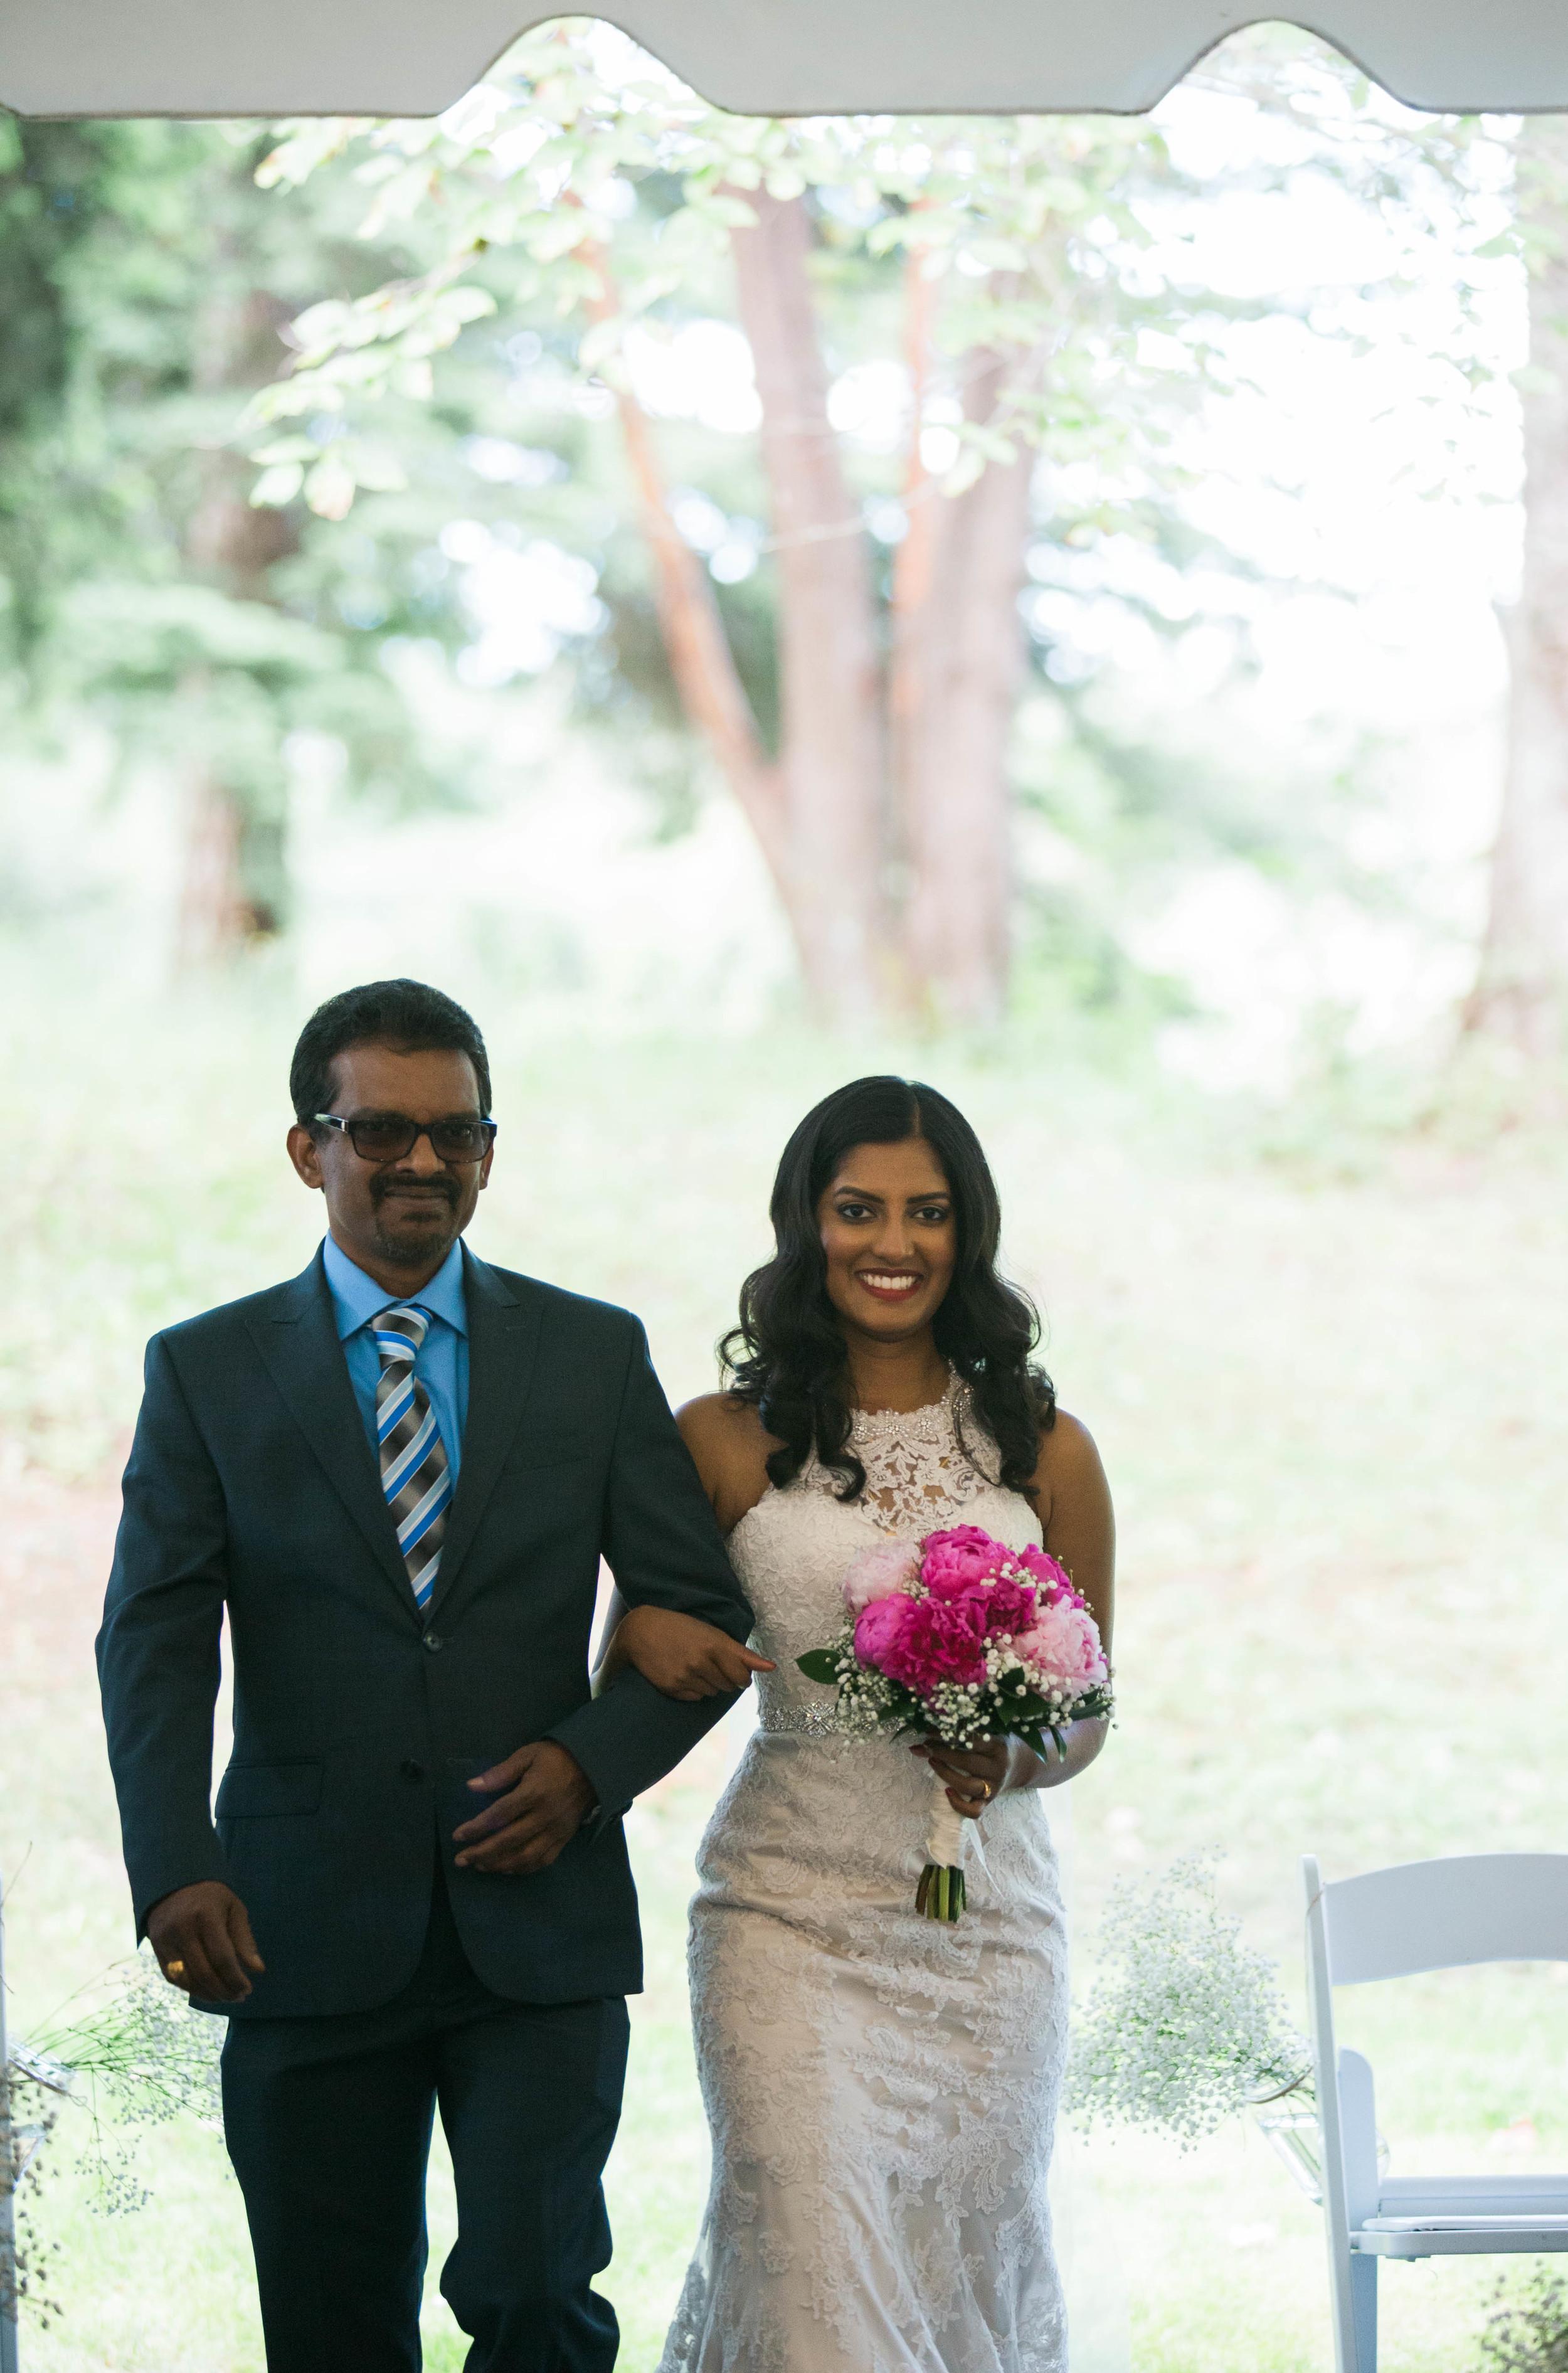 Hima+Dan_Wedding_Seattle+Couple_Kingston_6112016_1708.jpg